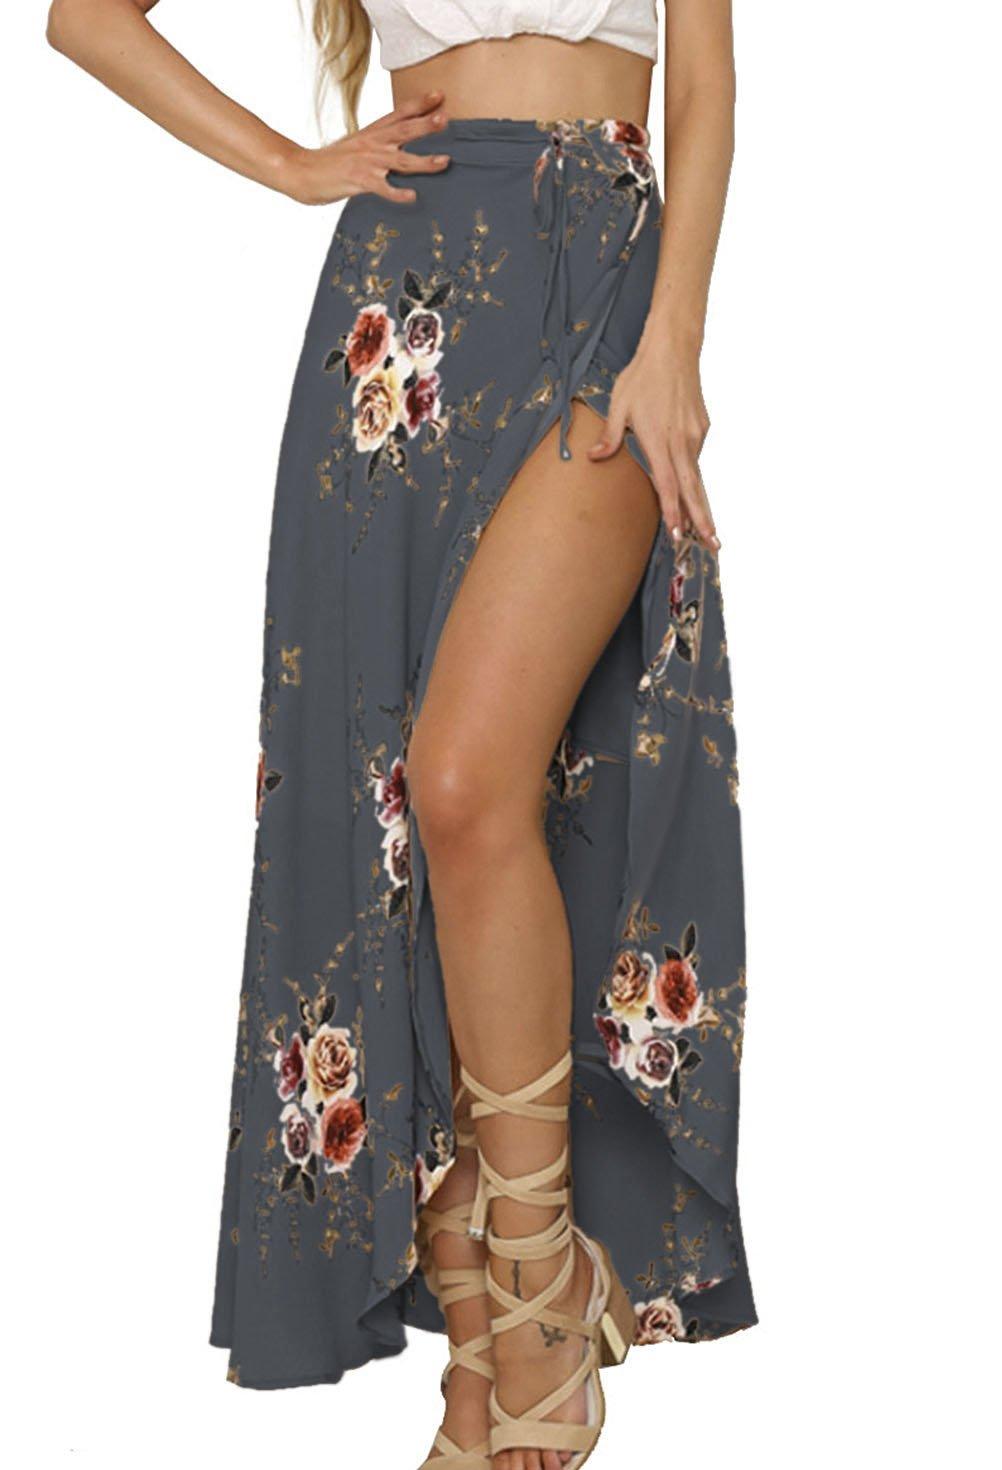 Yonala Womens Boho Floral Tie Up Waist Summer Beach Wrap Cover Up Maxi Skirt (S, Gray)